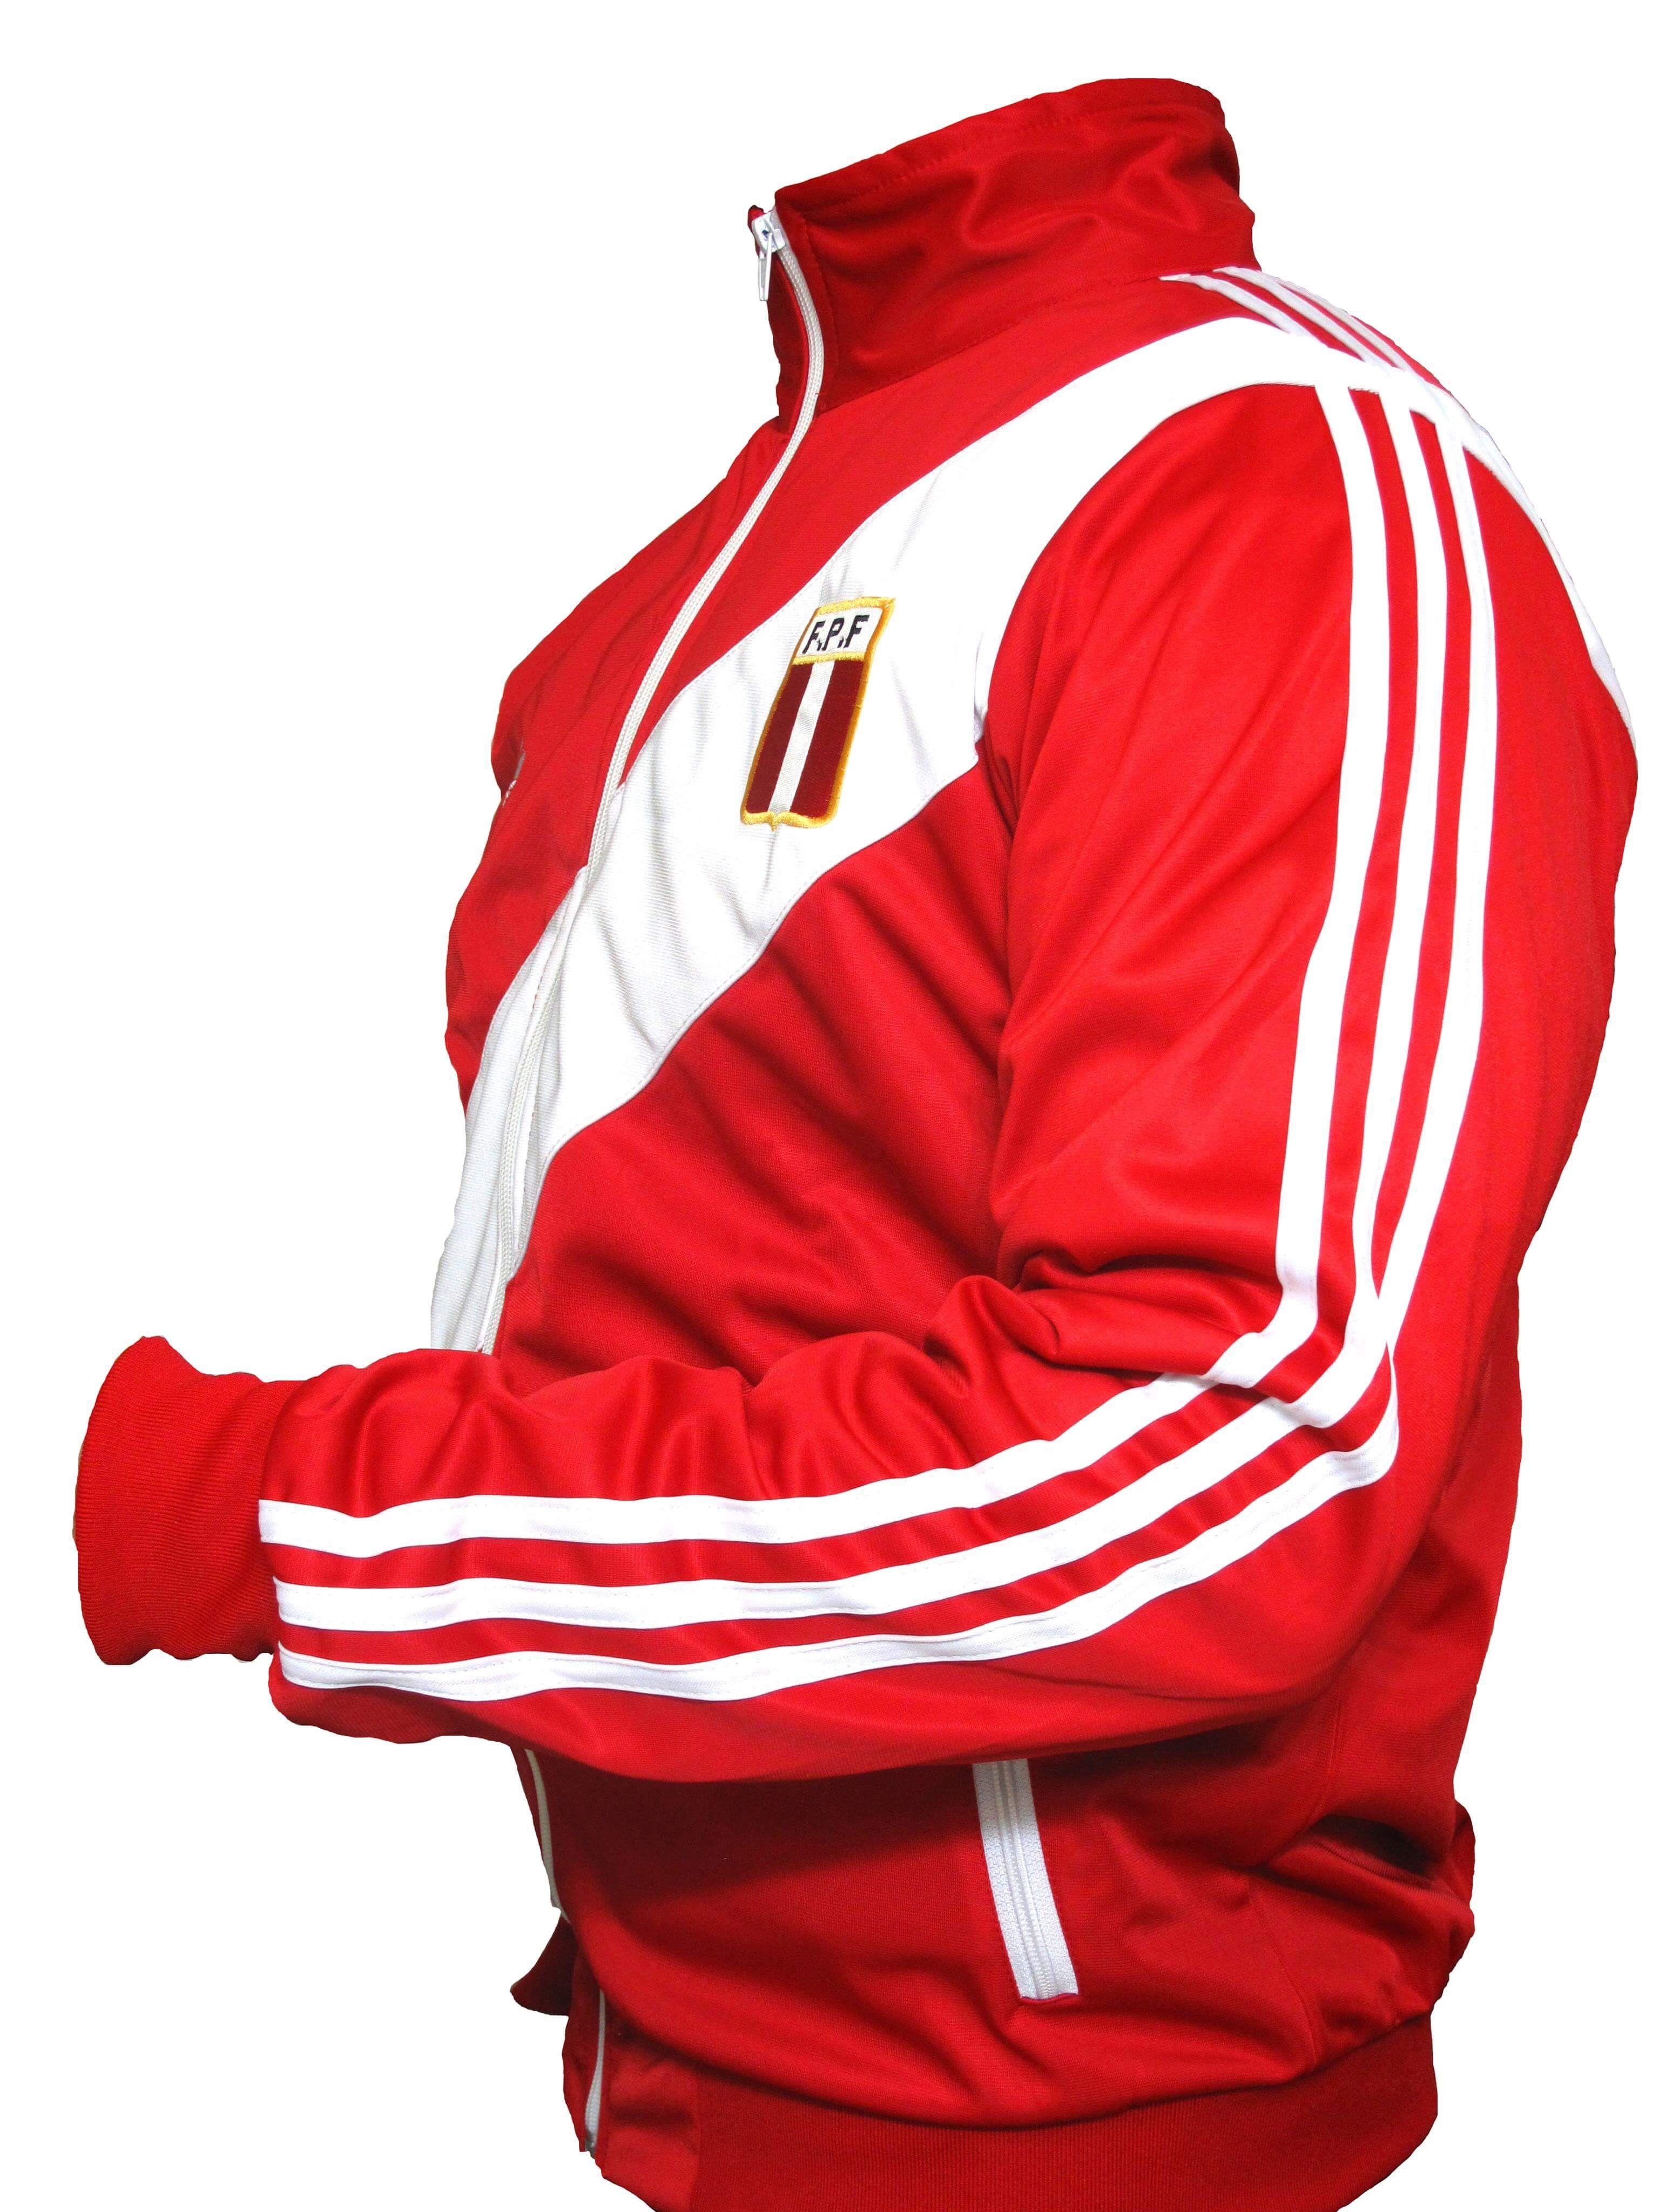 cefafb617 Adidas Peru national team soccer jersey World Cup ARGENTINA 78 ...